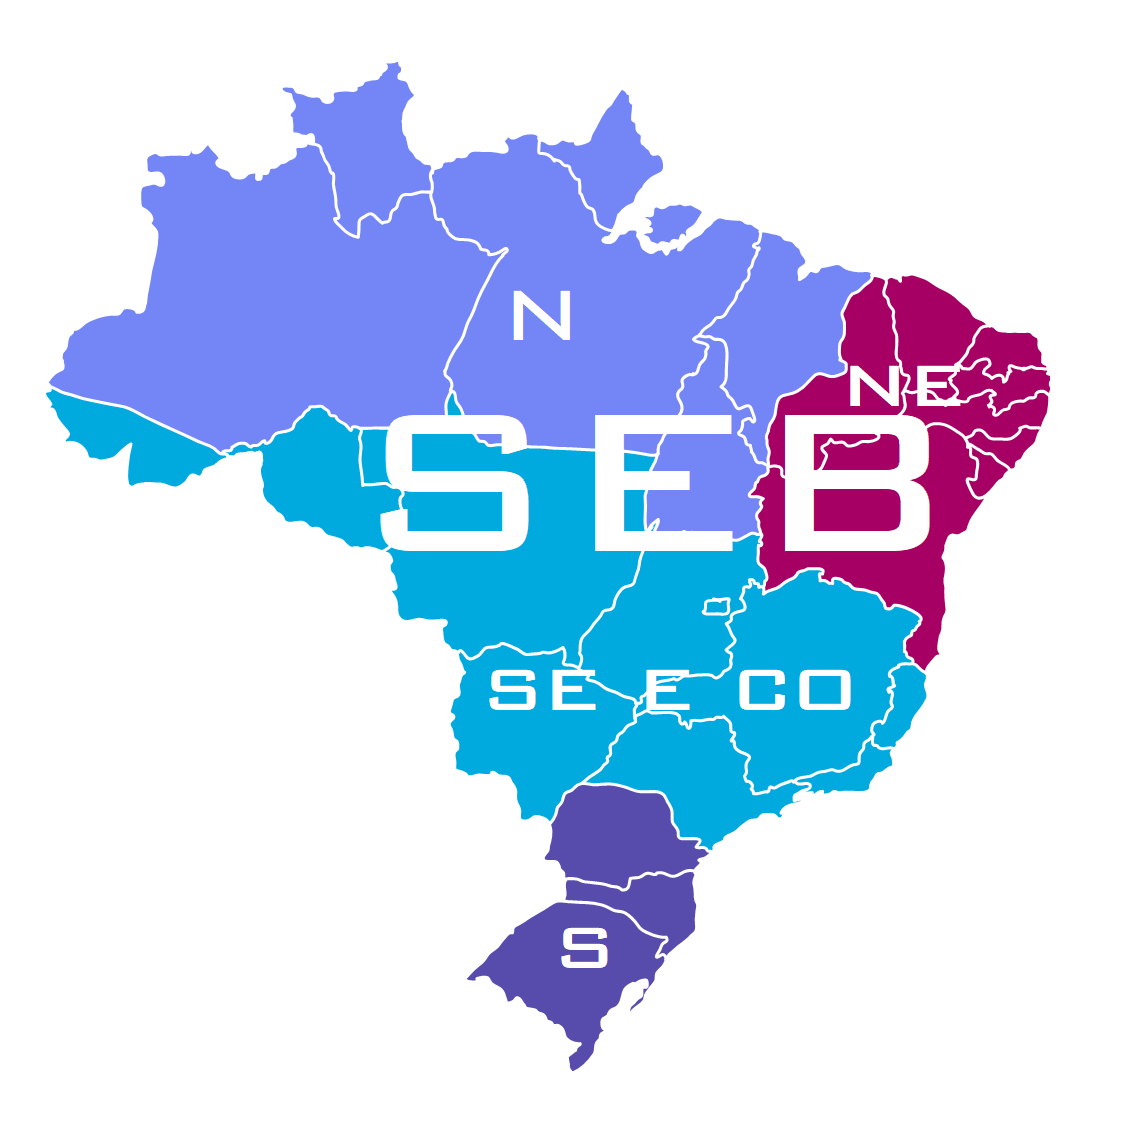 O Setor Elétrico Brasileiro